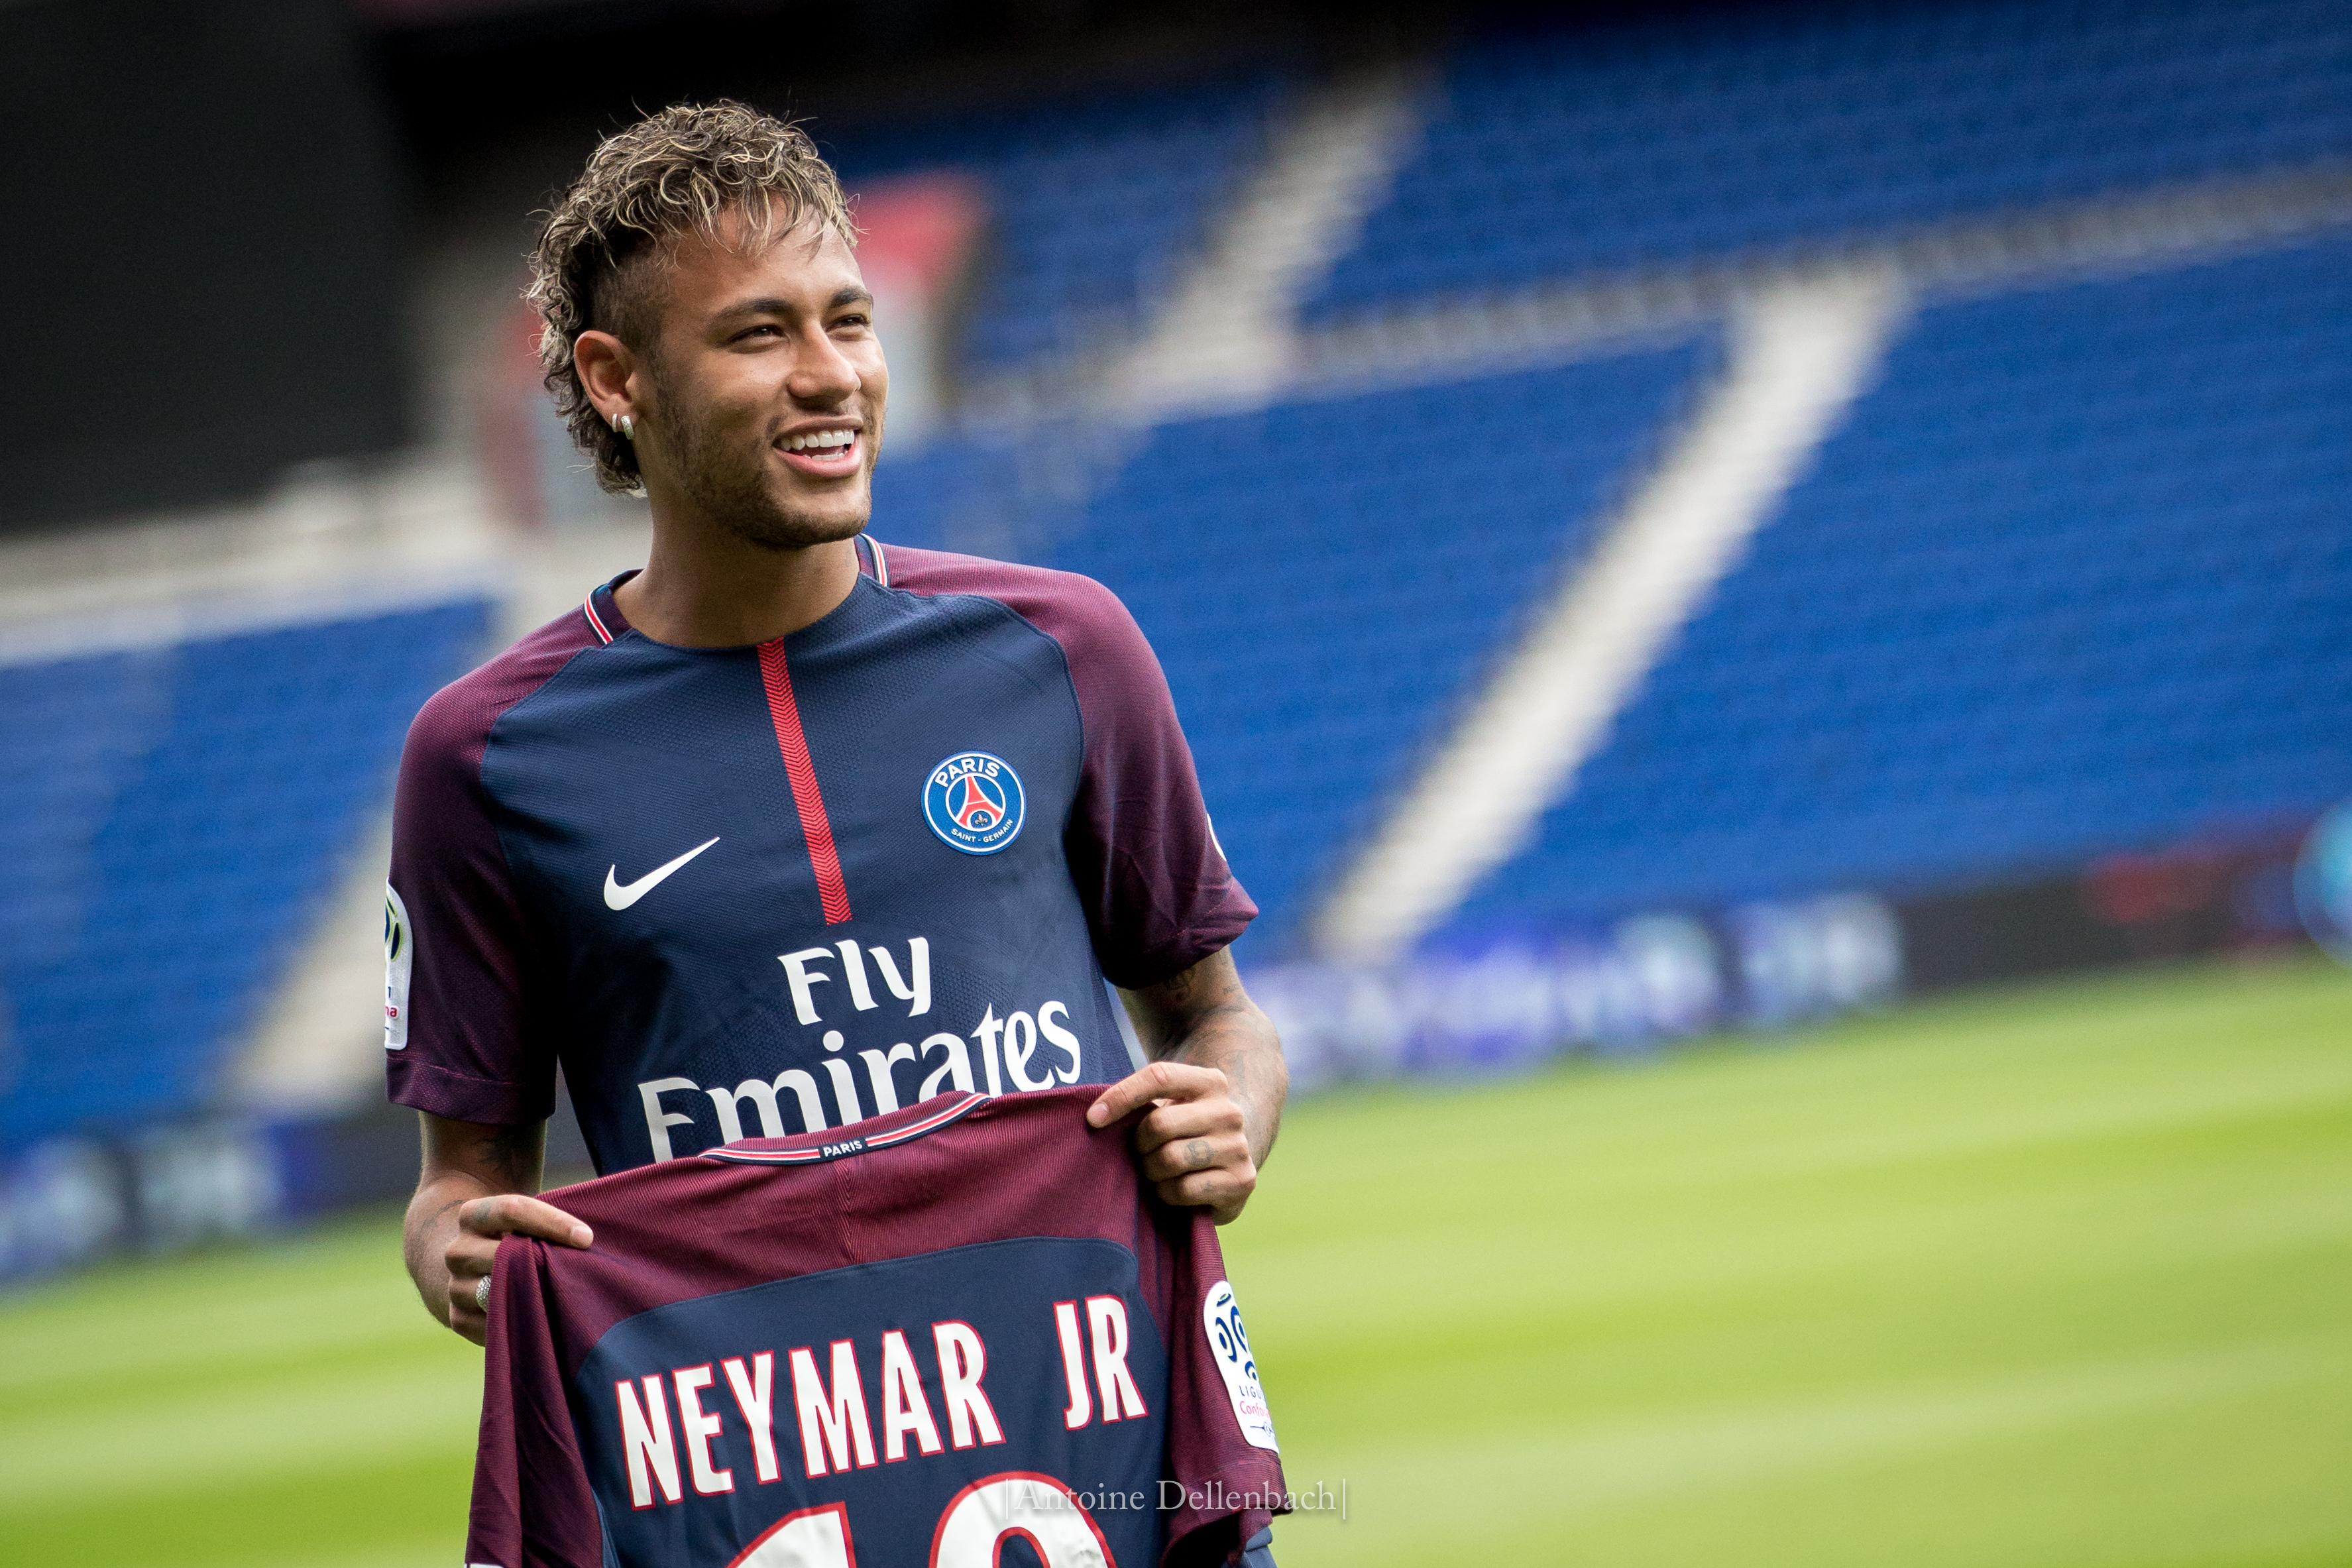 Neymar sanction uefa